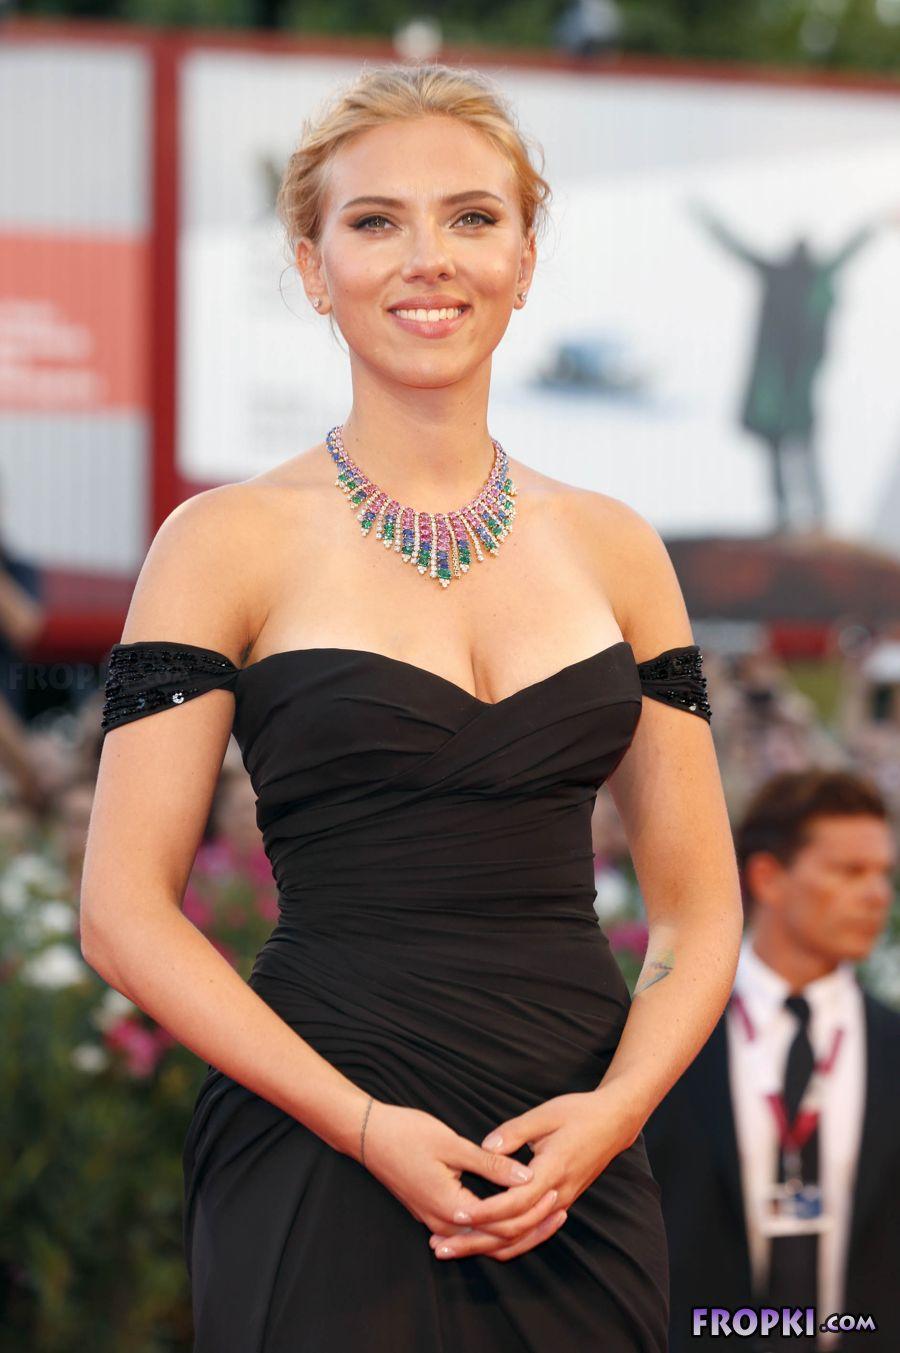 Scarlett Johansson Fropki 42